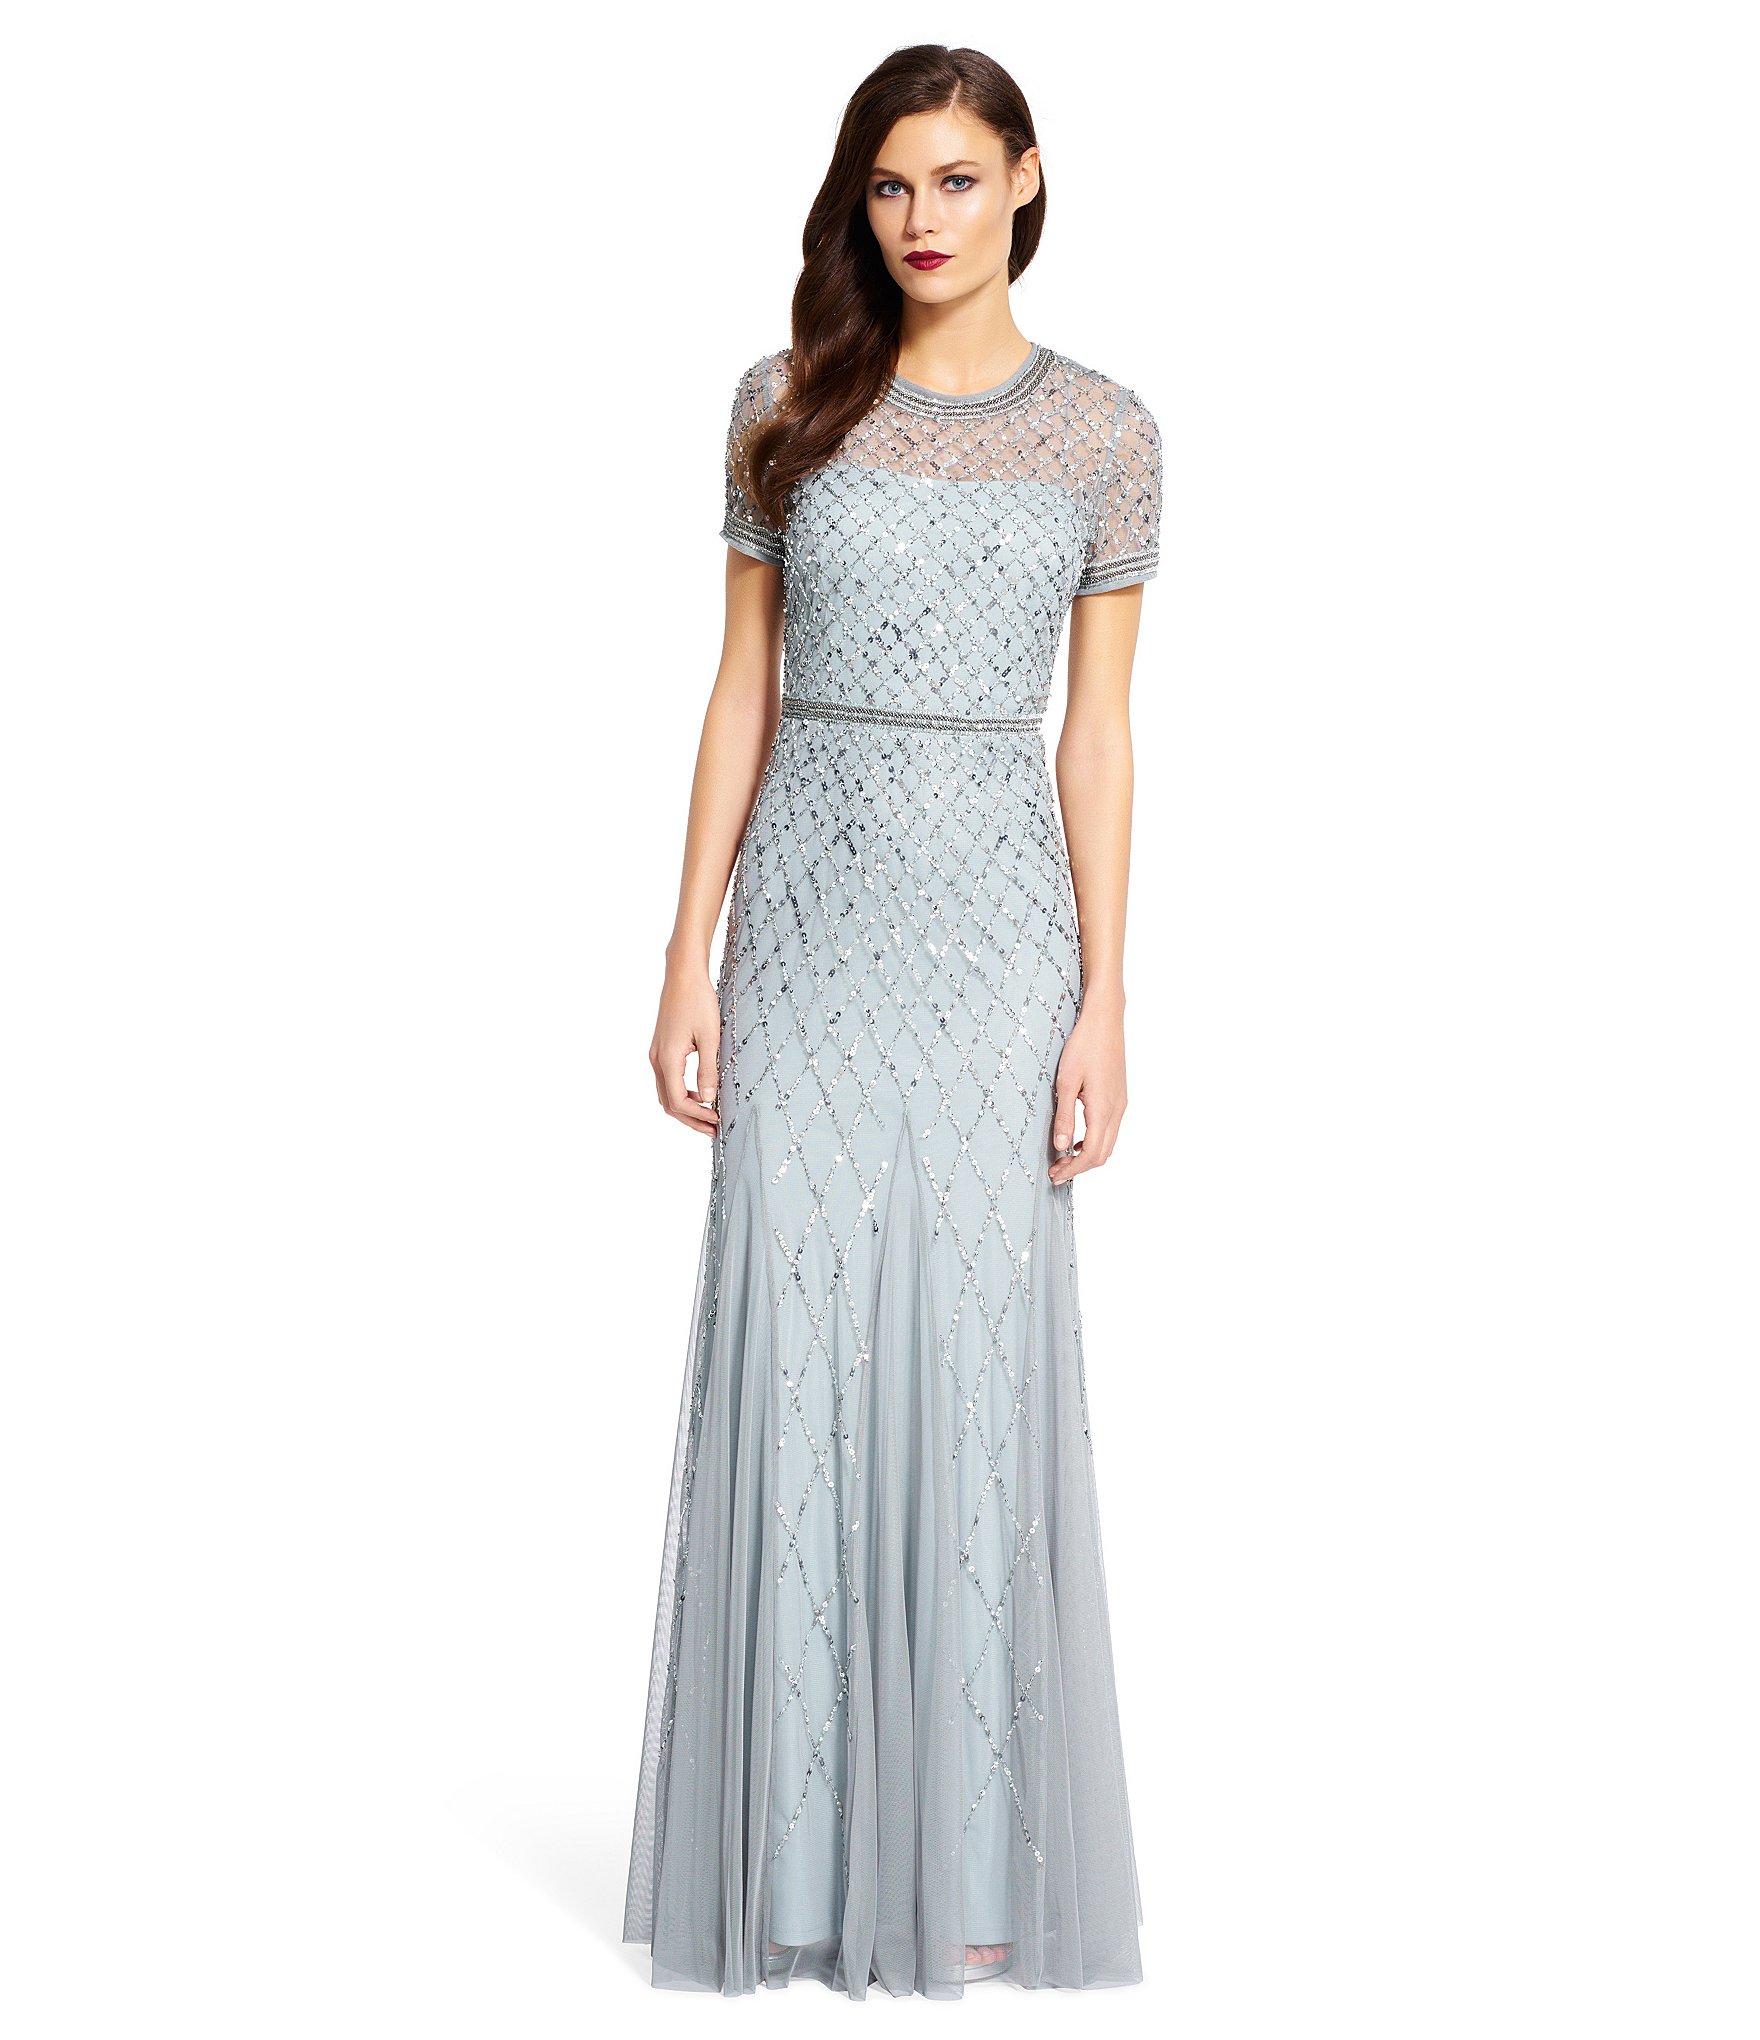 Adrianna Papell Dillard\'s Dresses – Dresses for Woman